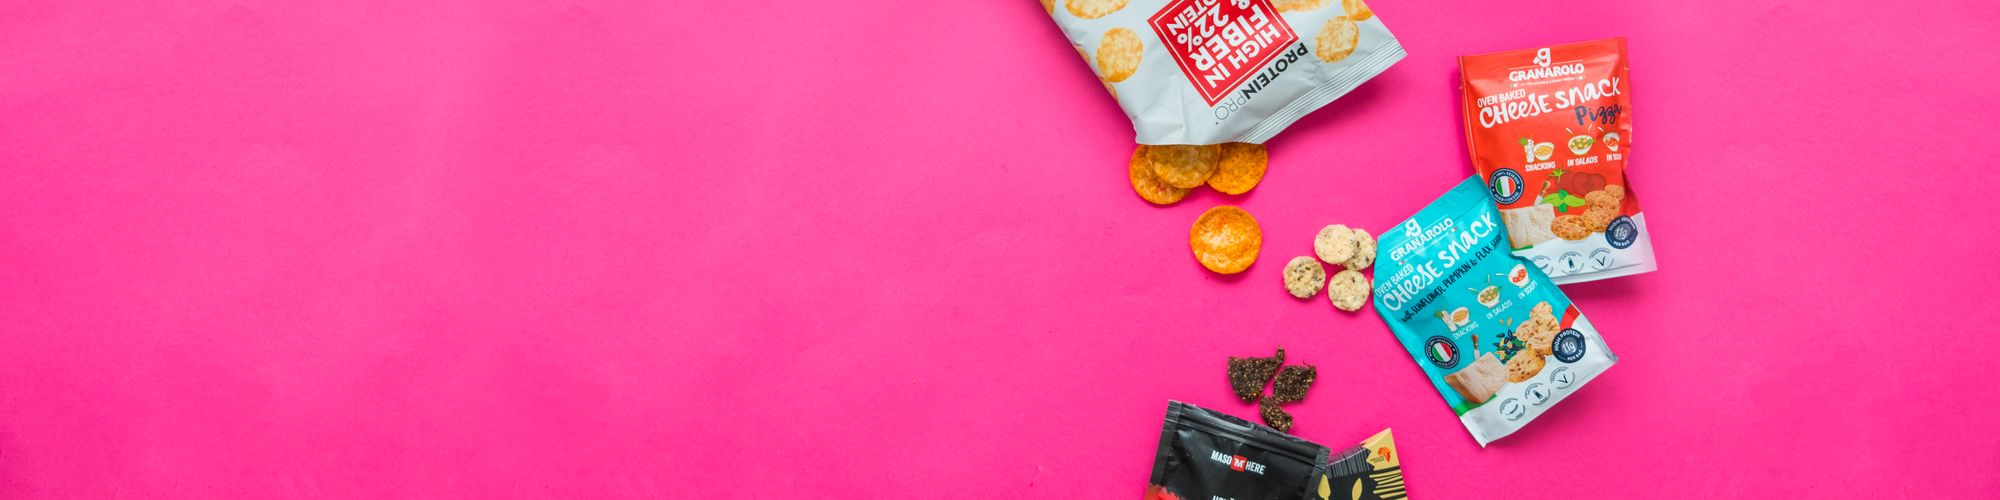 Slané i sladké dobroty s proteinem